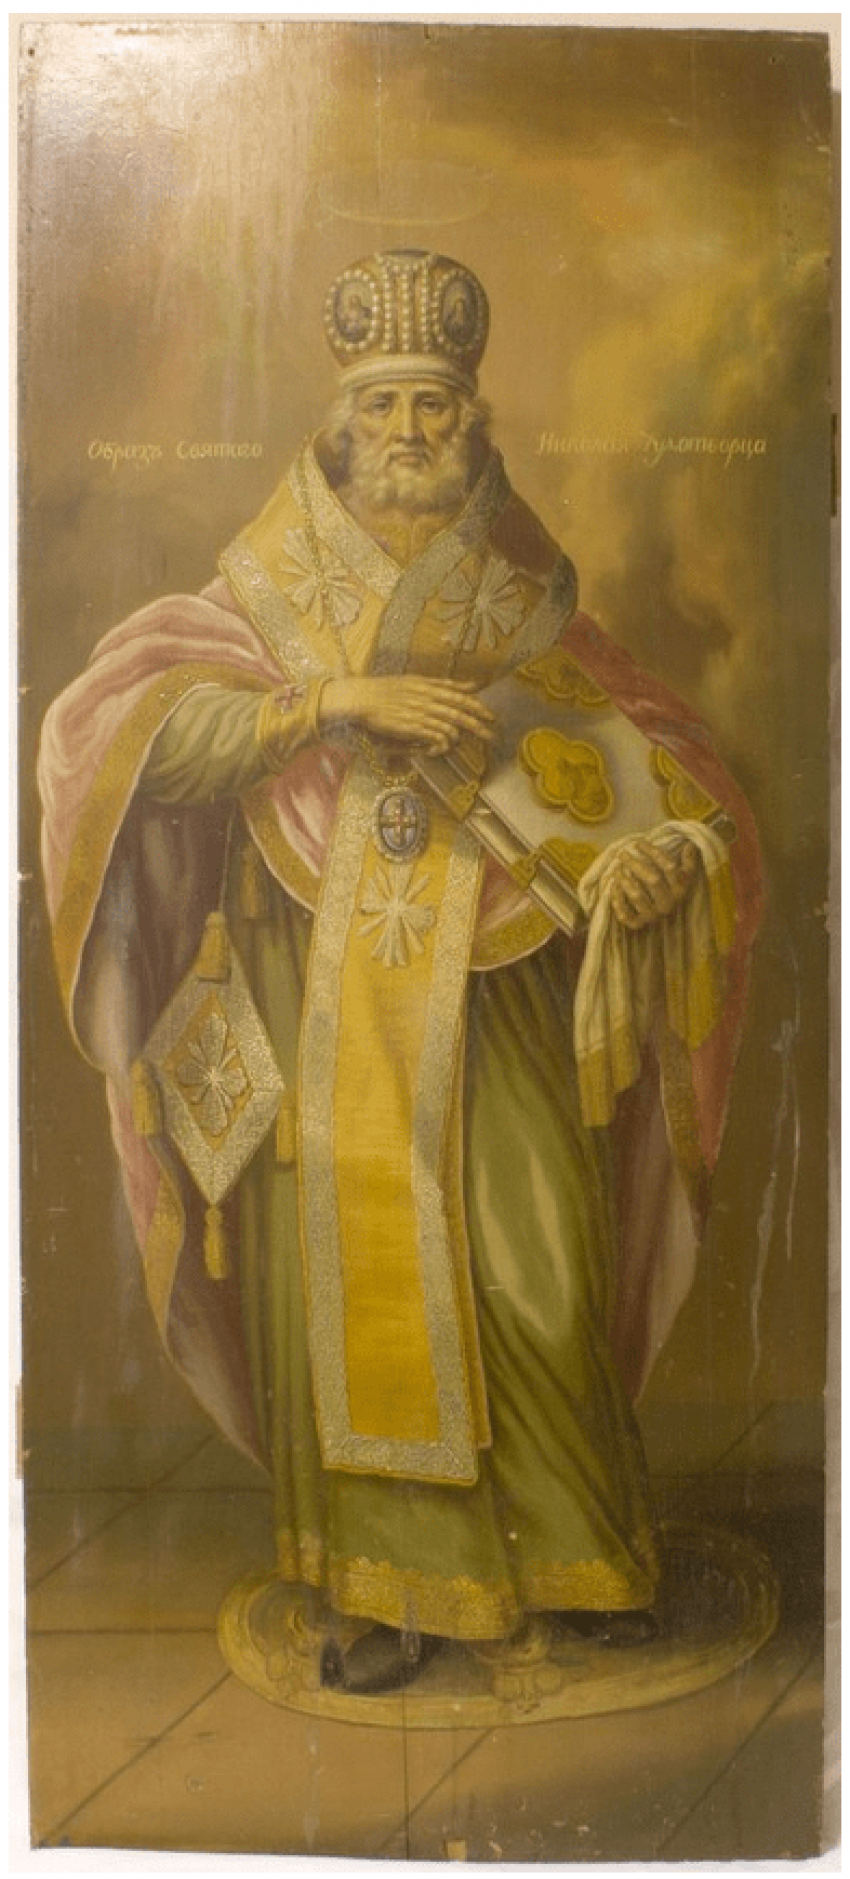 Образ Николая Чудотворца 19 век, - фото 1